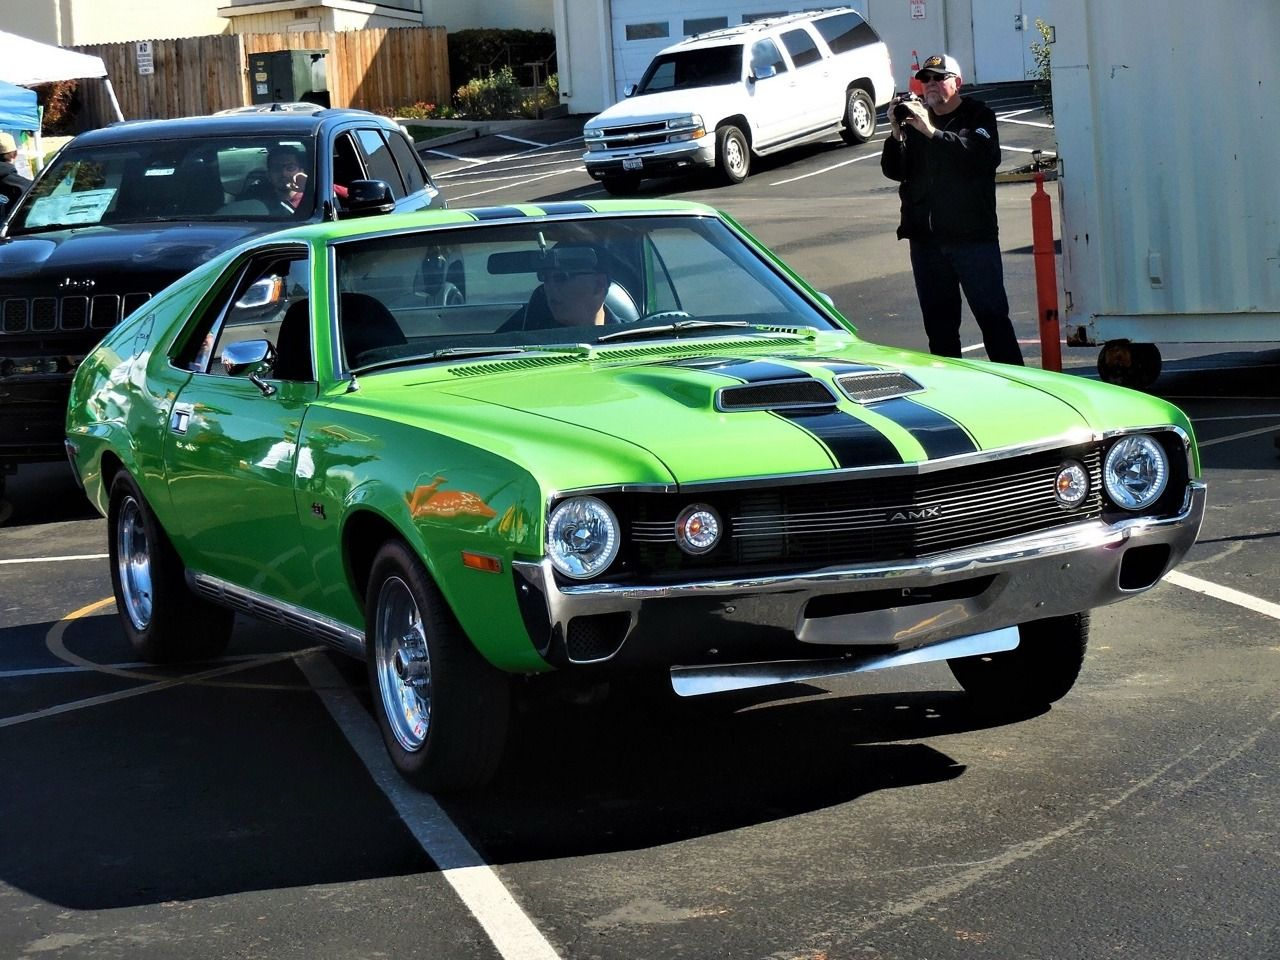 pinvern plum on awesomeness1 | classic cars, cars, american motors